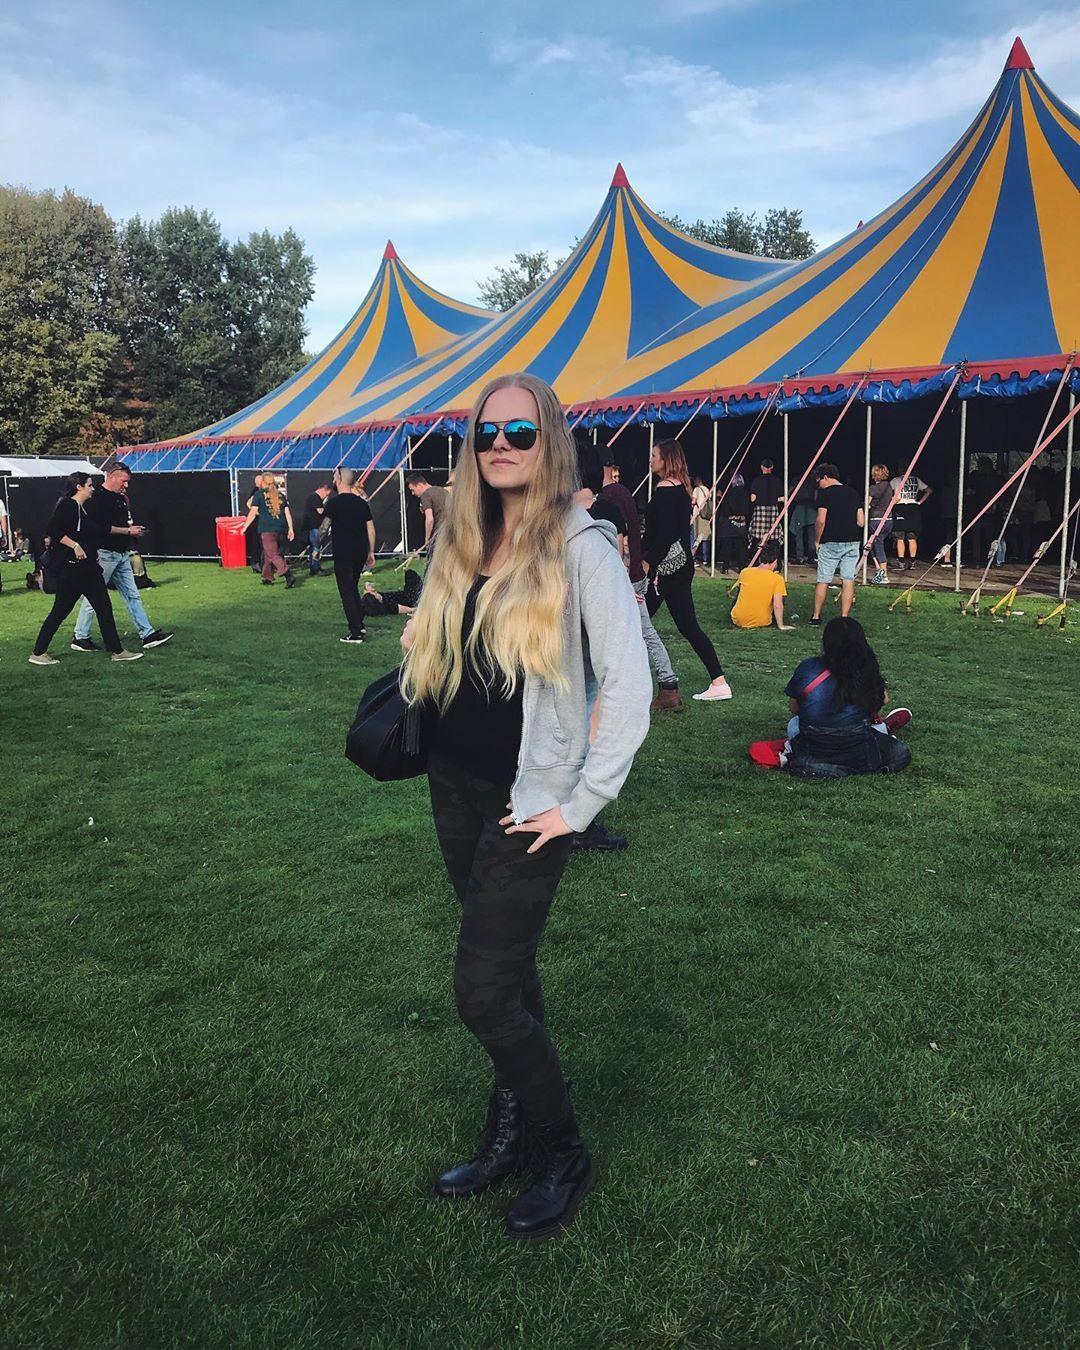 Baroeg Open Air 😎 #festival #festivaloutfit #weekendvibes #fitness #beastmode #eatsleeptrainrepeat...